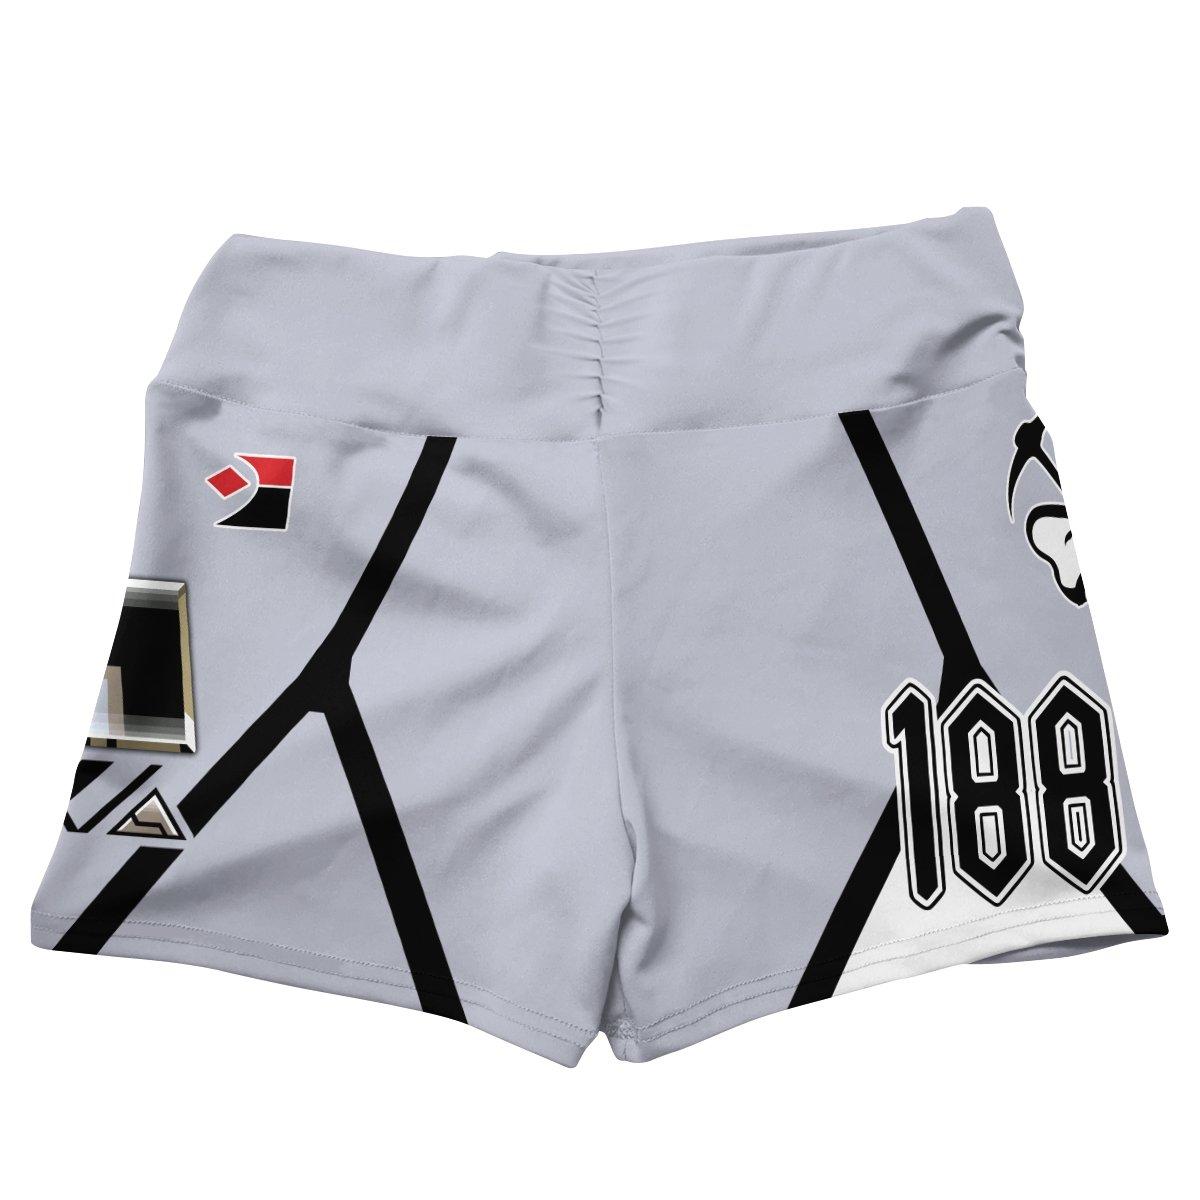 pokemon rock uniform active wear set 963822 - Anime Swimsuits